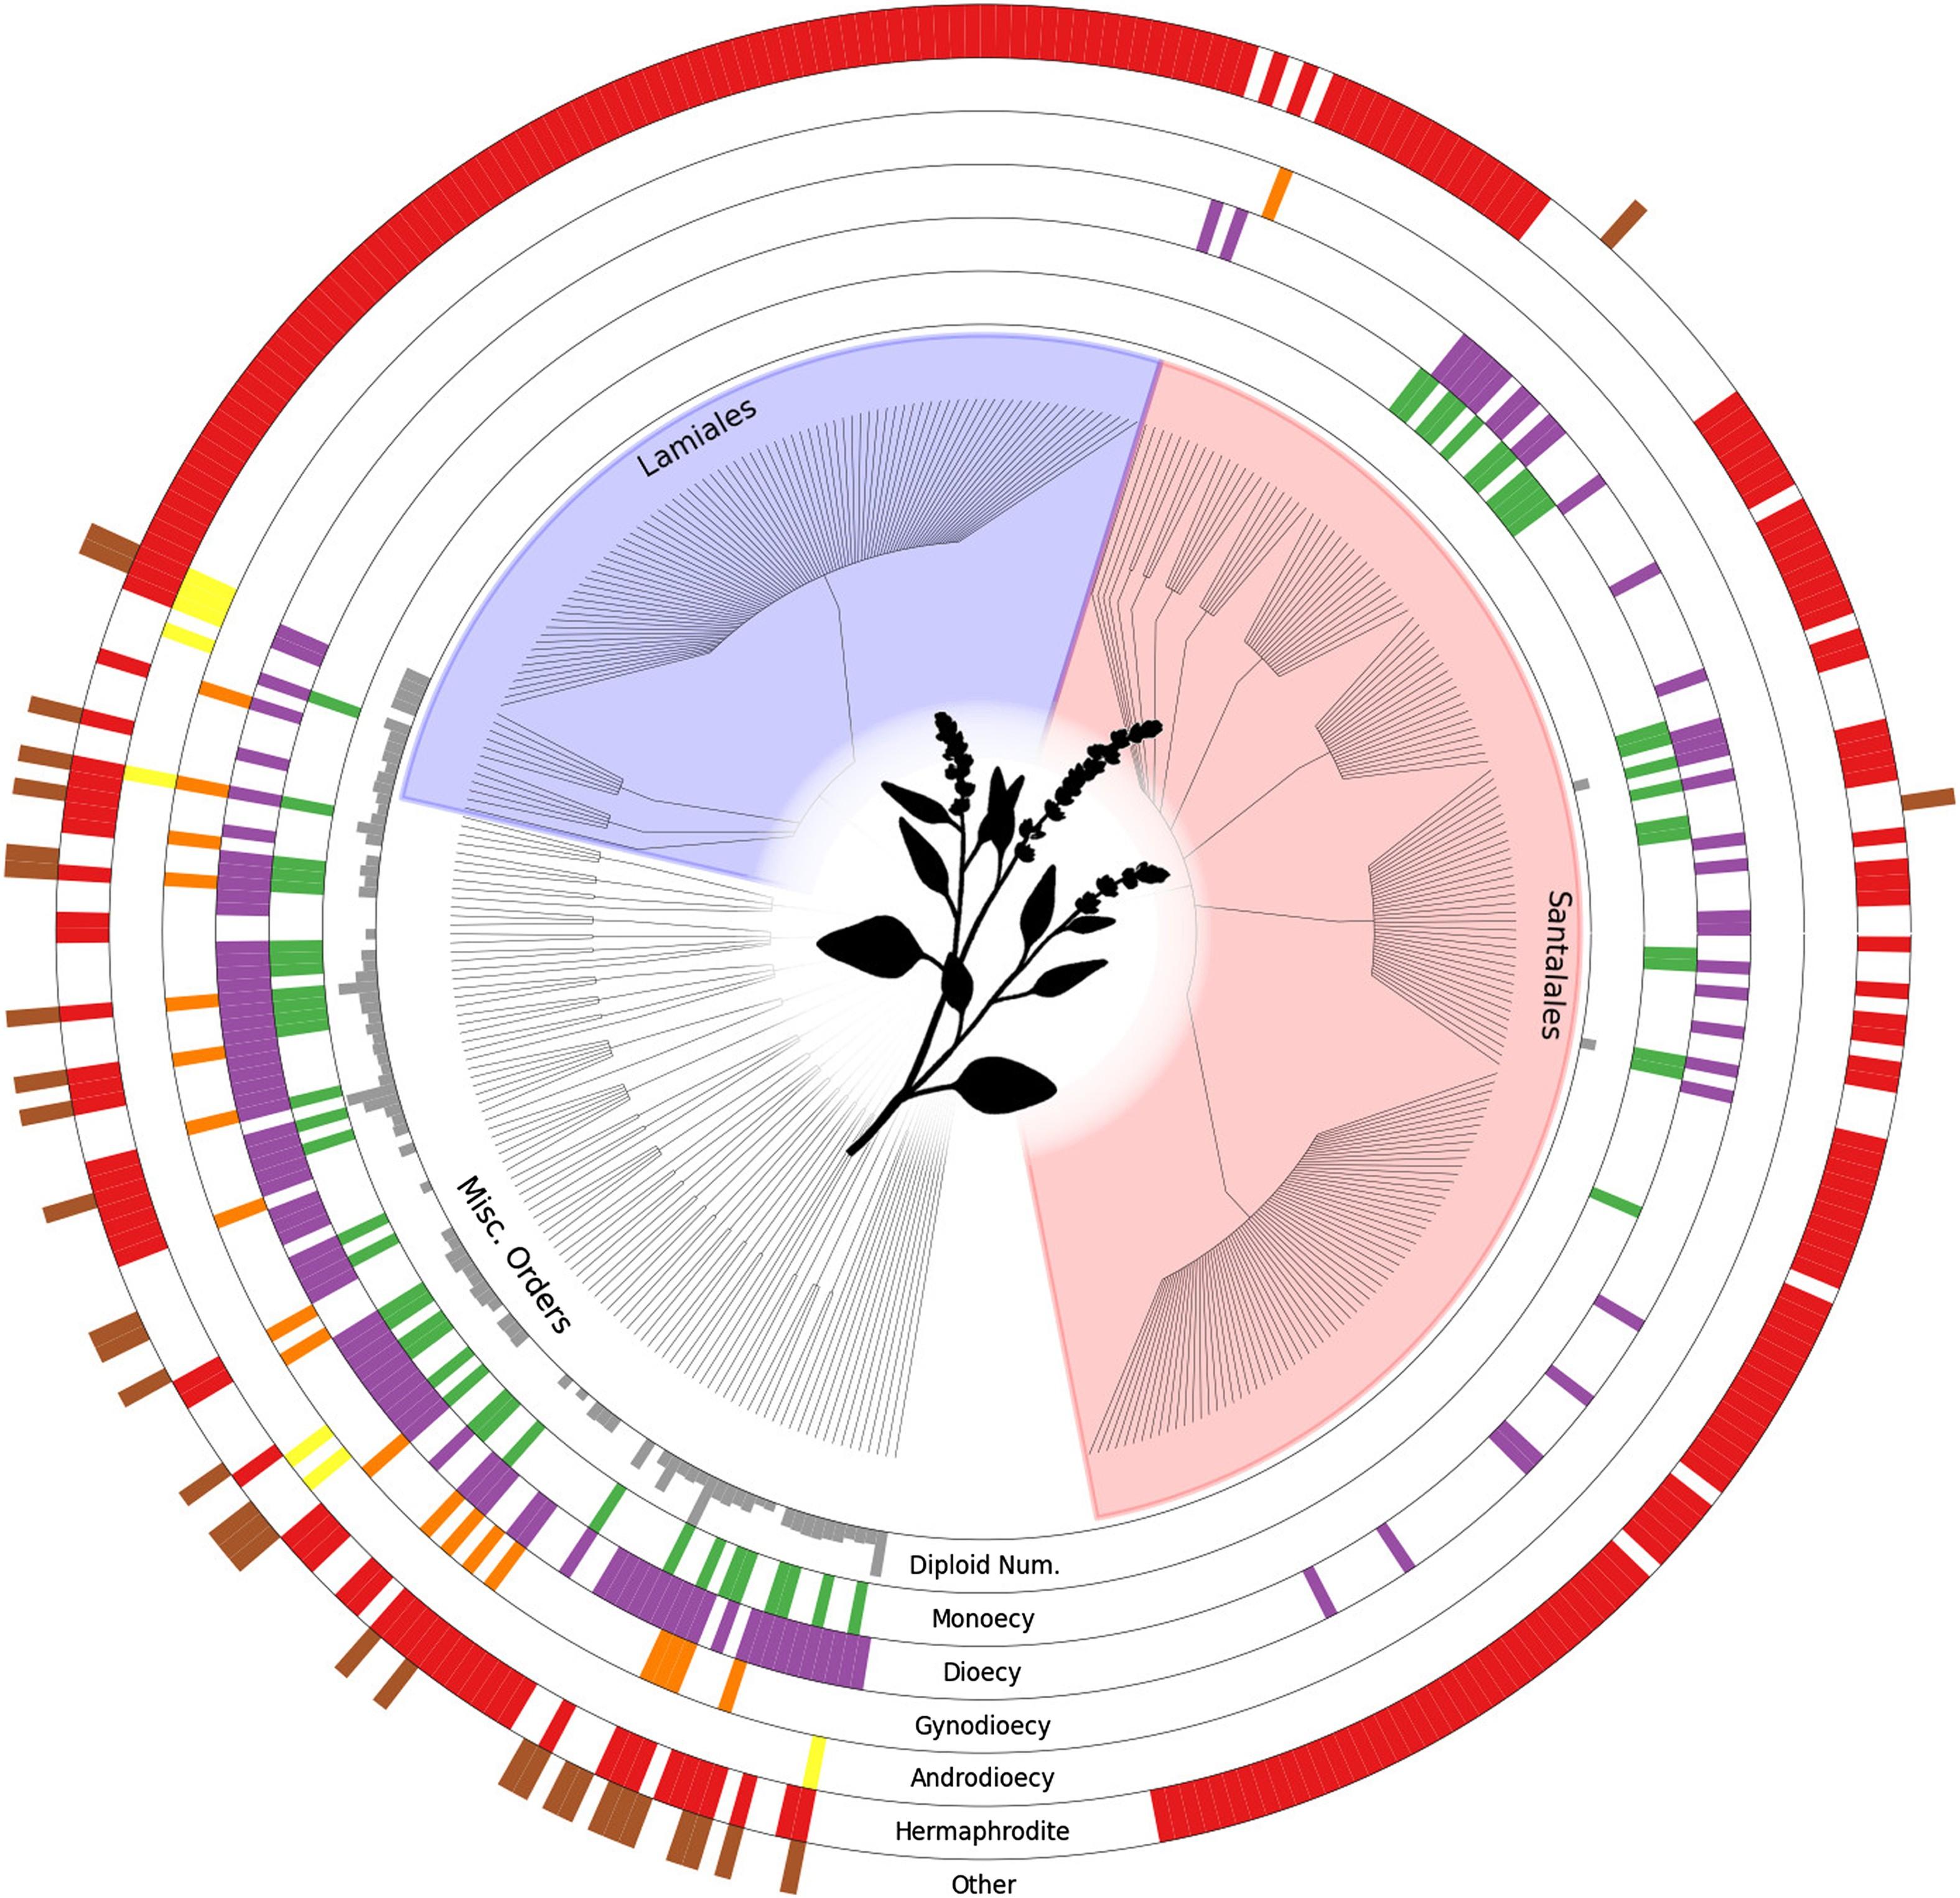 Ana Paula Fernández Santacruz Ruiz tree of sex: a database of sexual systems | scientific data